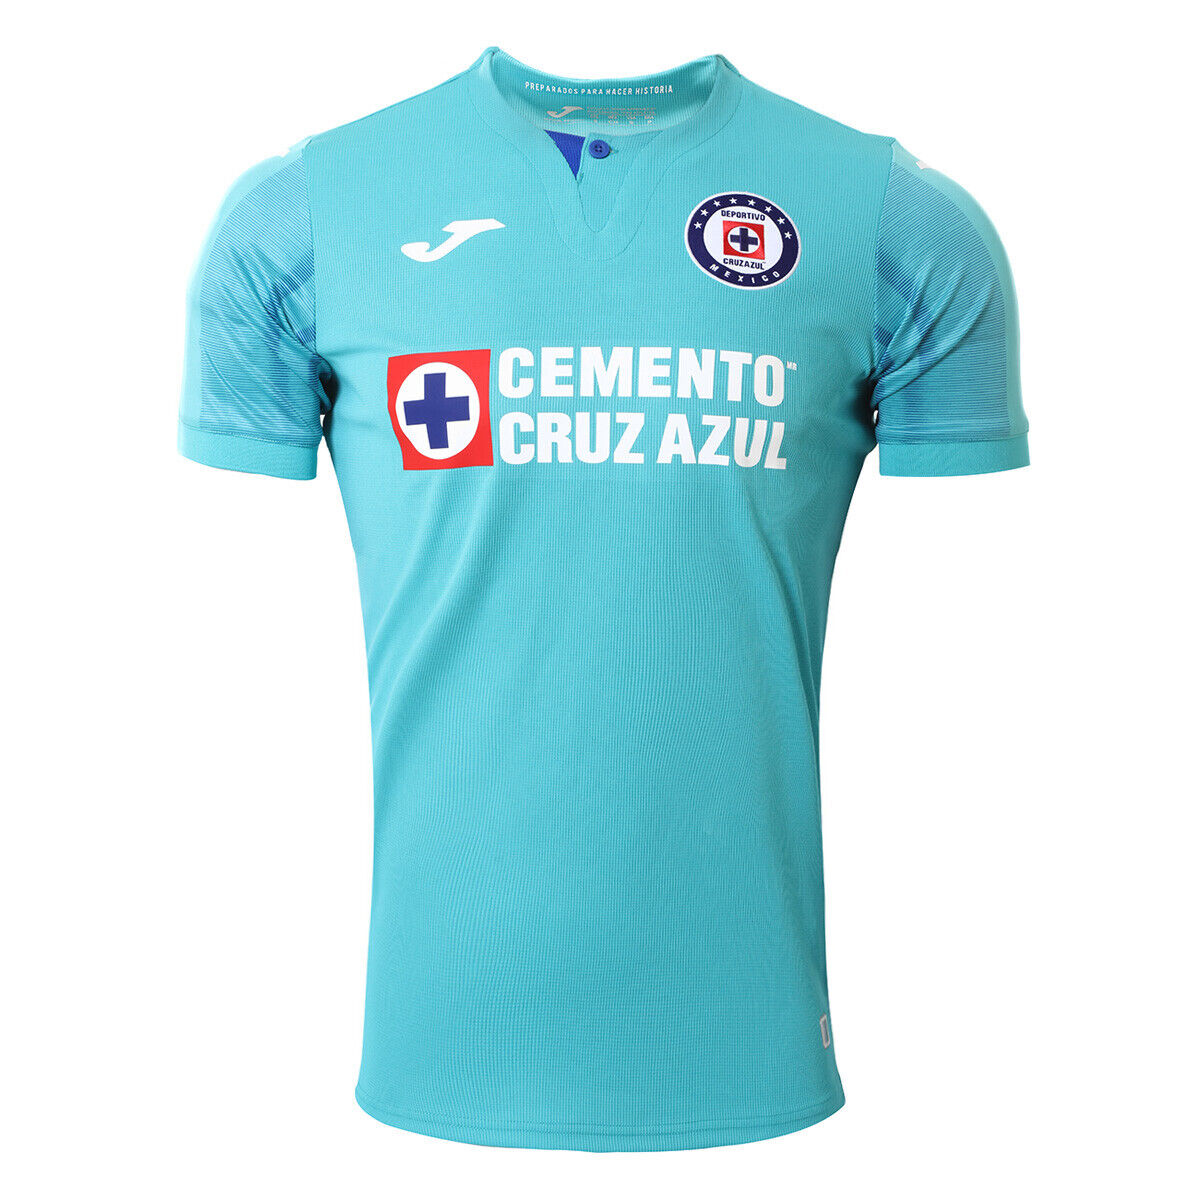 Joma 2019 Cruz Azul Home Soccer Stadium Jersey Blue CR101011.18*